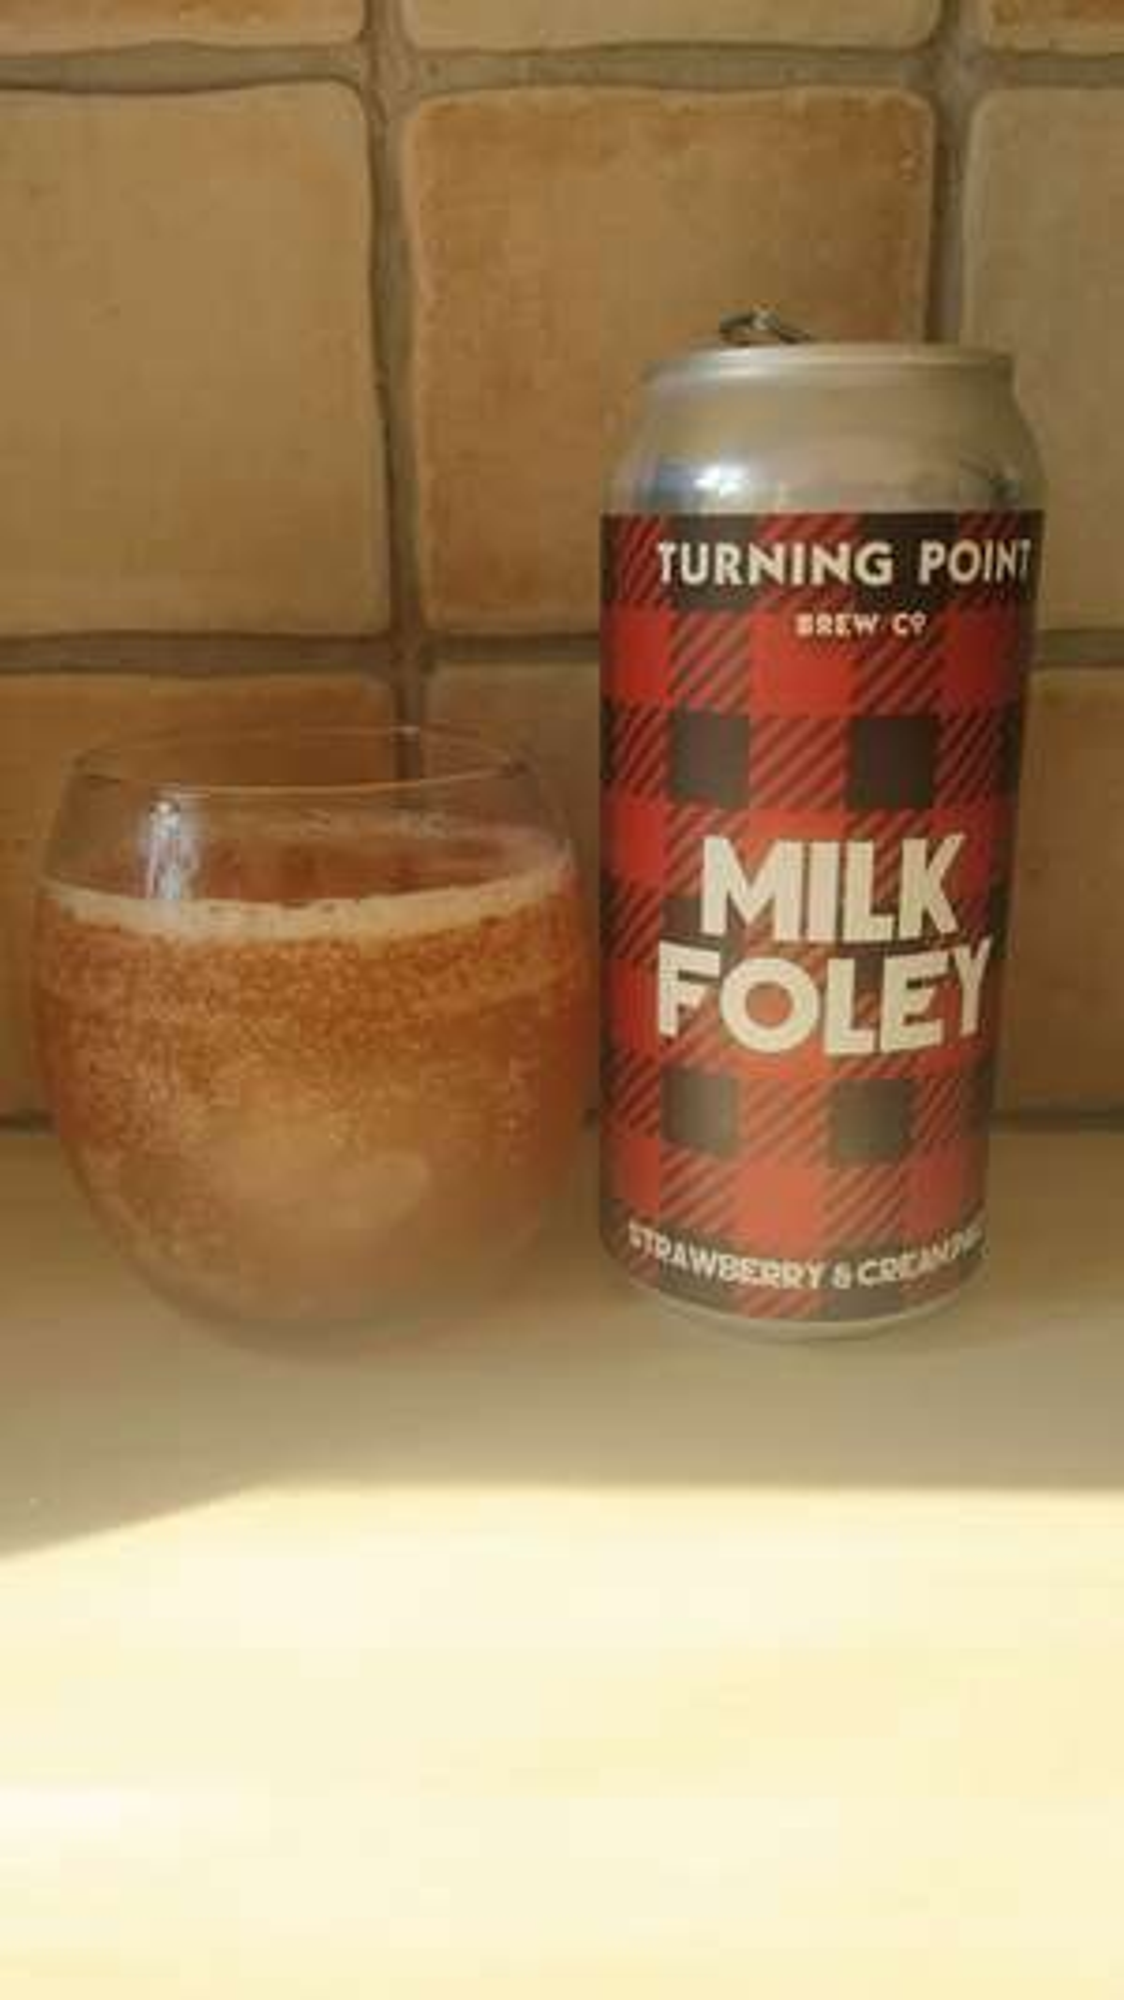 Milk Foley Pale Ale £2 instore @ Sainsbury's Crayford